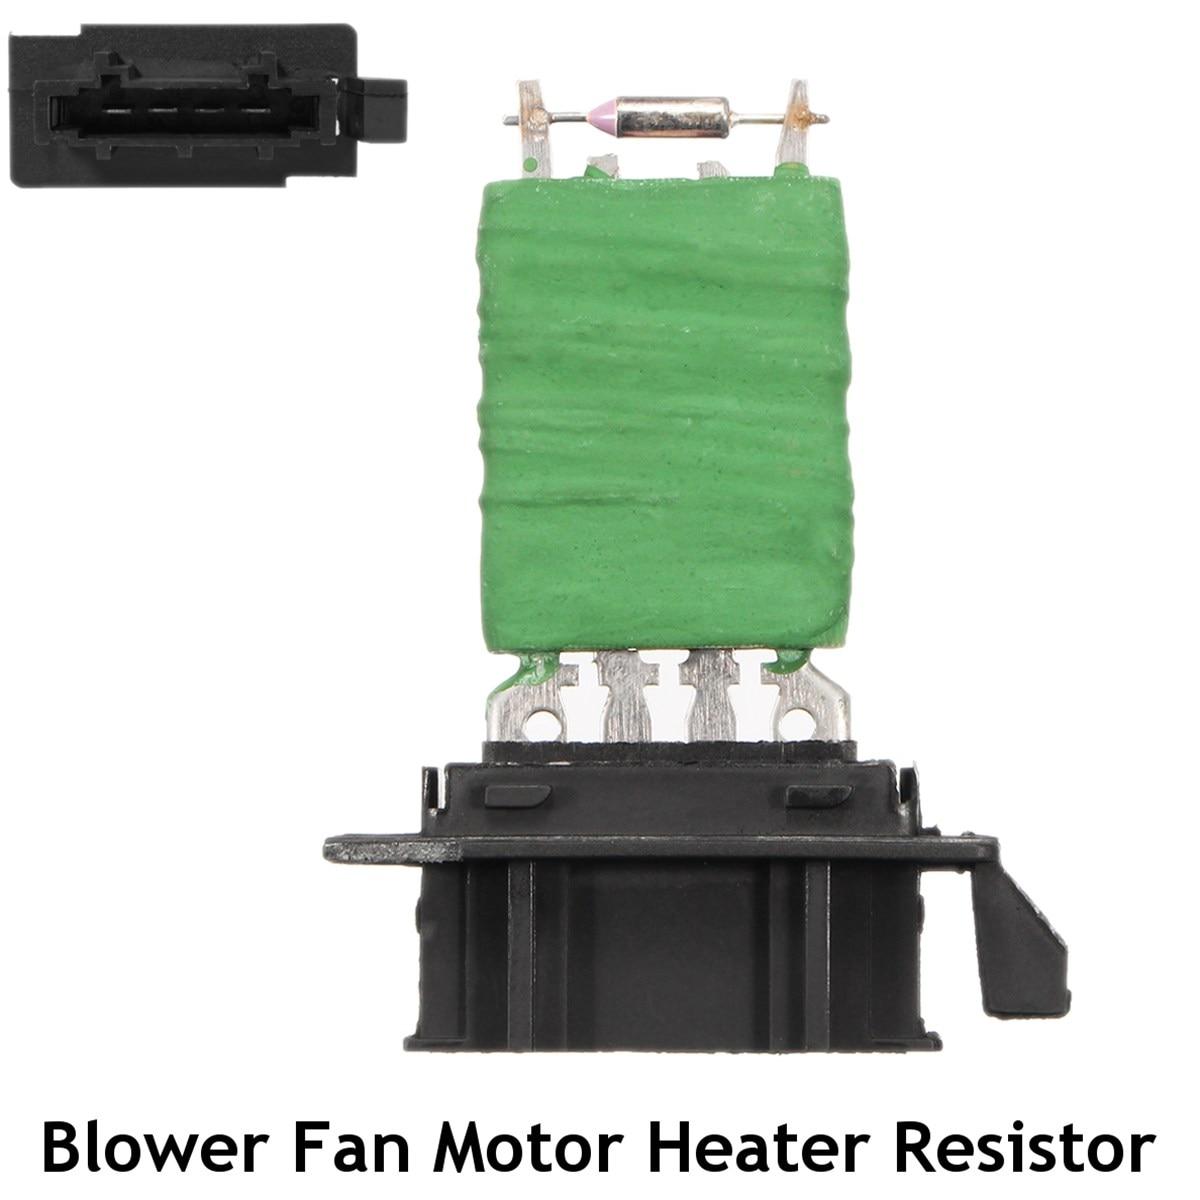 Motor Heater Blower fan carbon brushes Siemens Heater Motor Mercede Sprinter T10